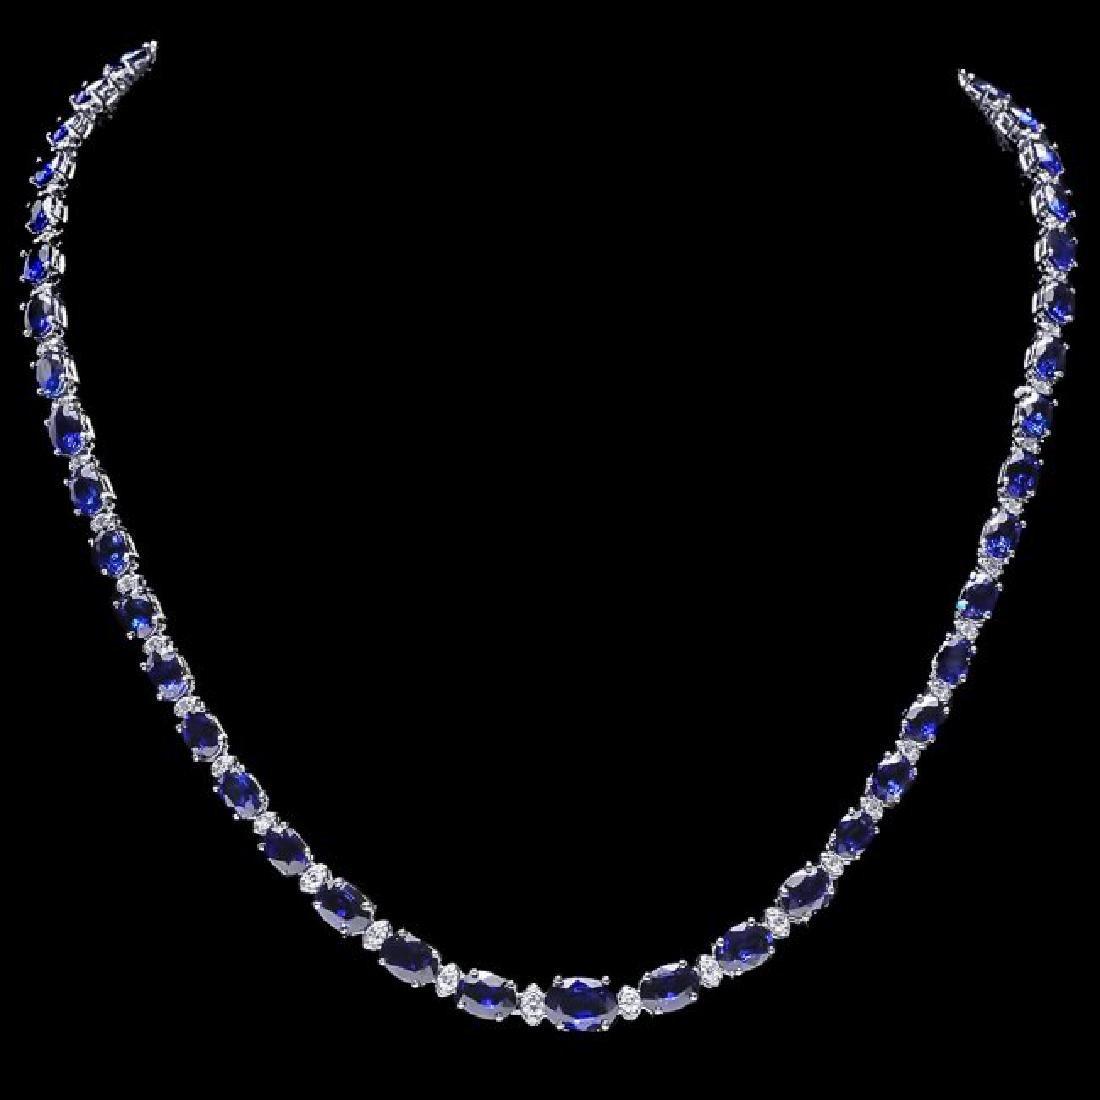 14k Gold 29ct Sapphire 1.10ct Diamond Necklace